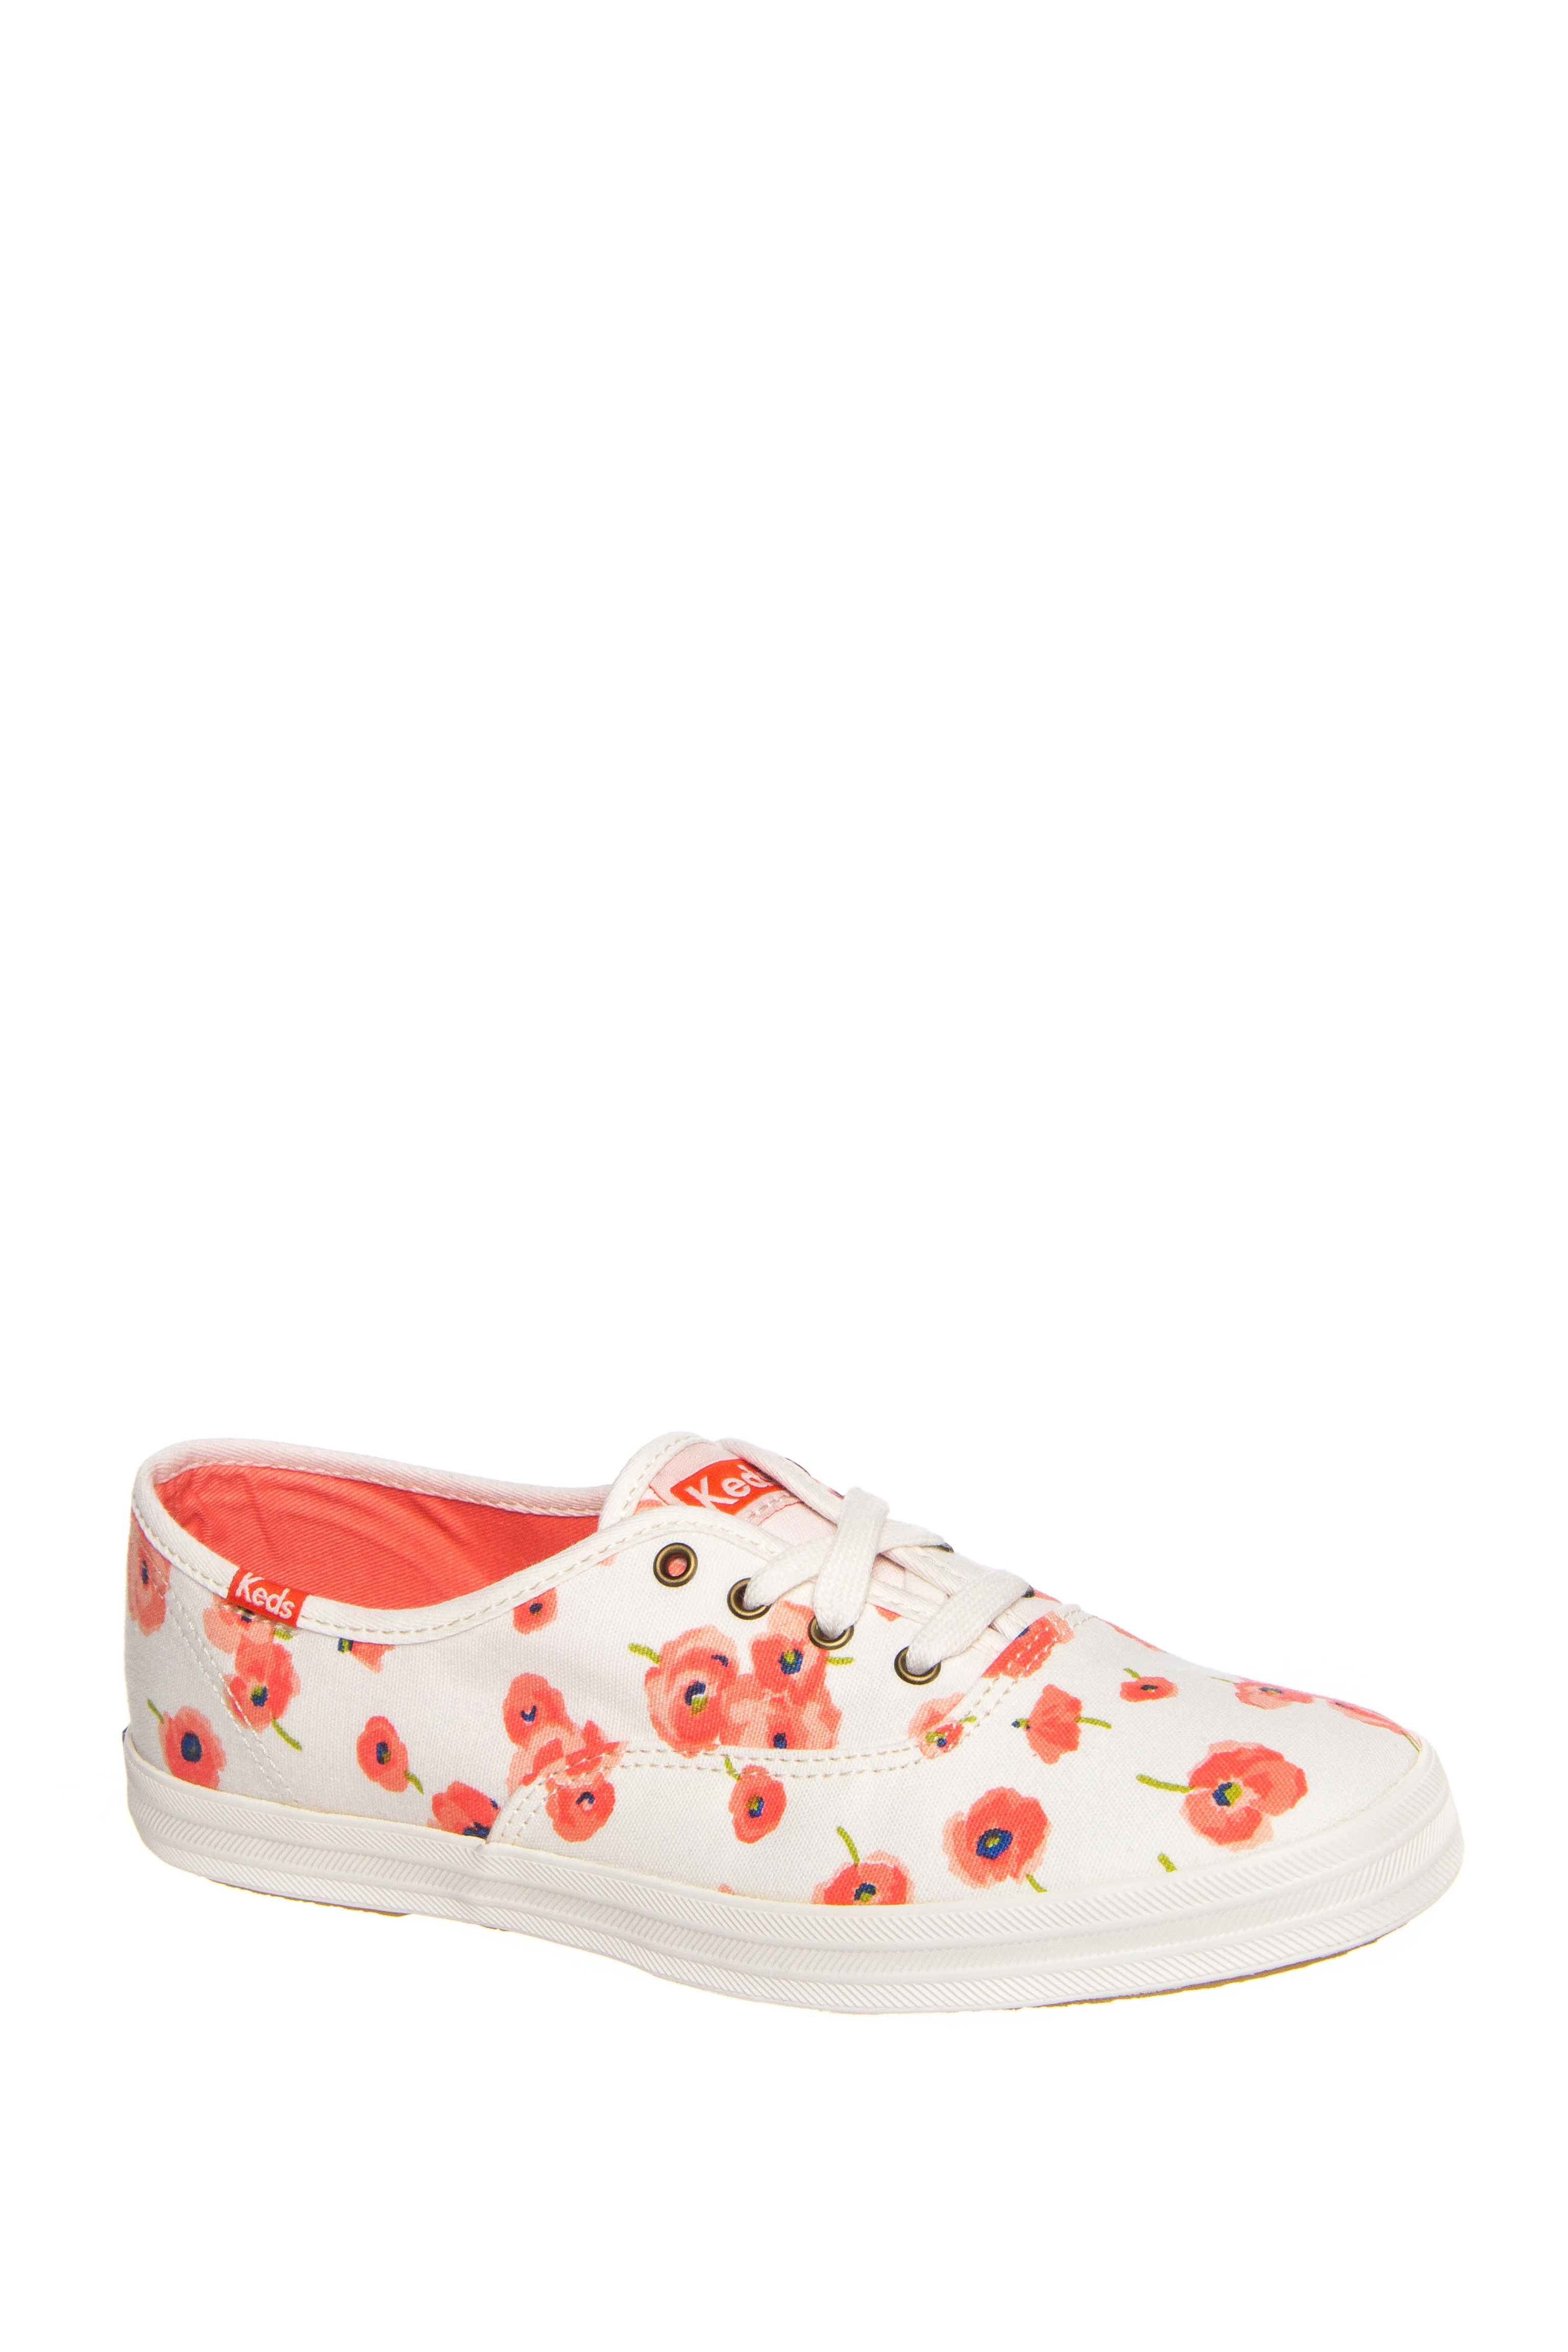 Keds Champion Poppy Low Top Sneakers - Cream Poppy Print